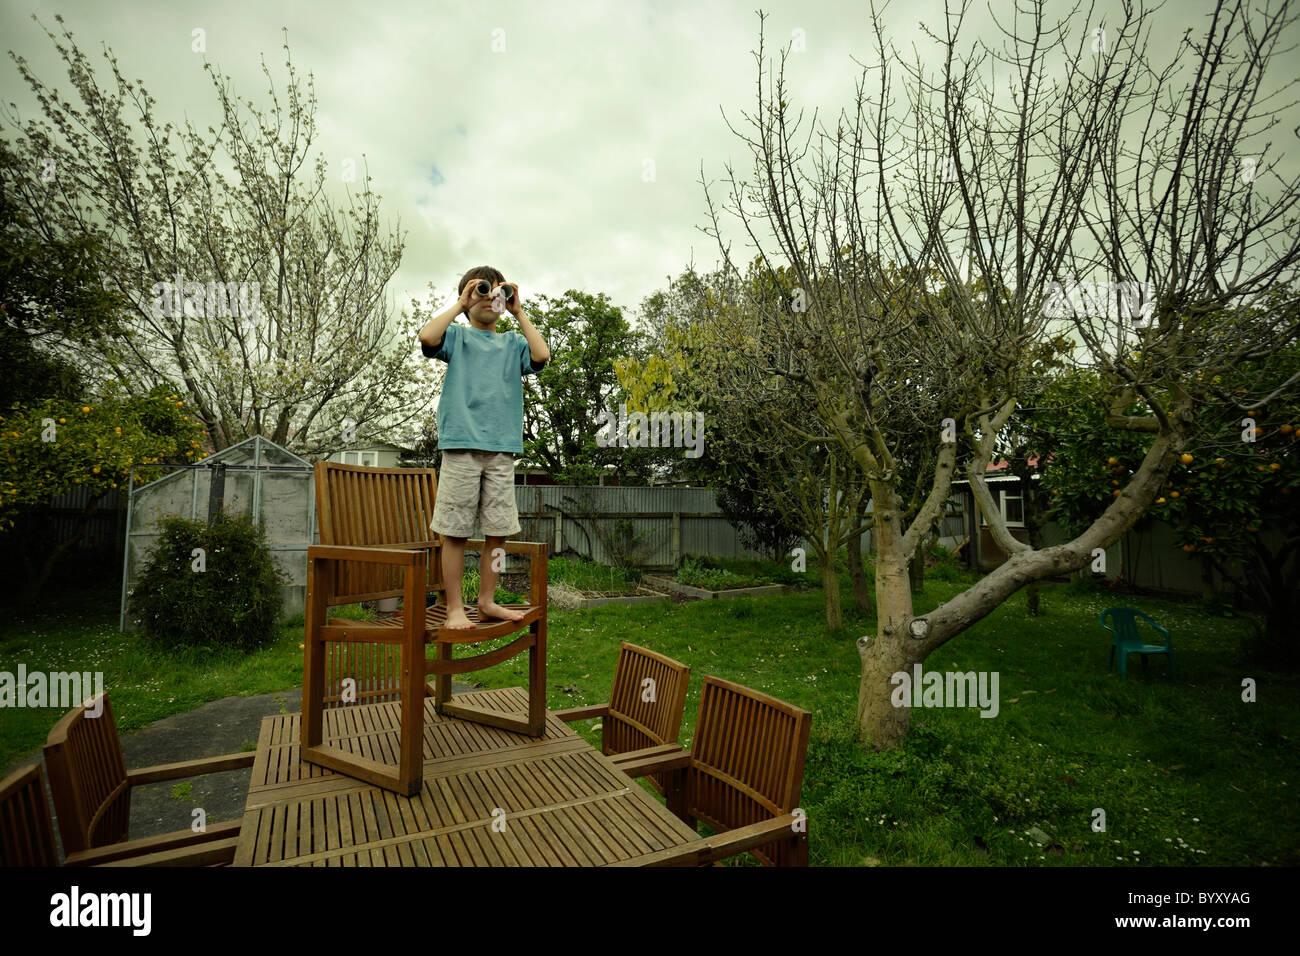 Boy stand on chair on garden table, using cardboard tubes as pretend binoculars. Stock Photo